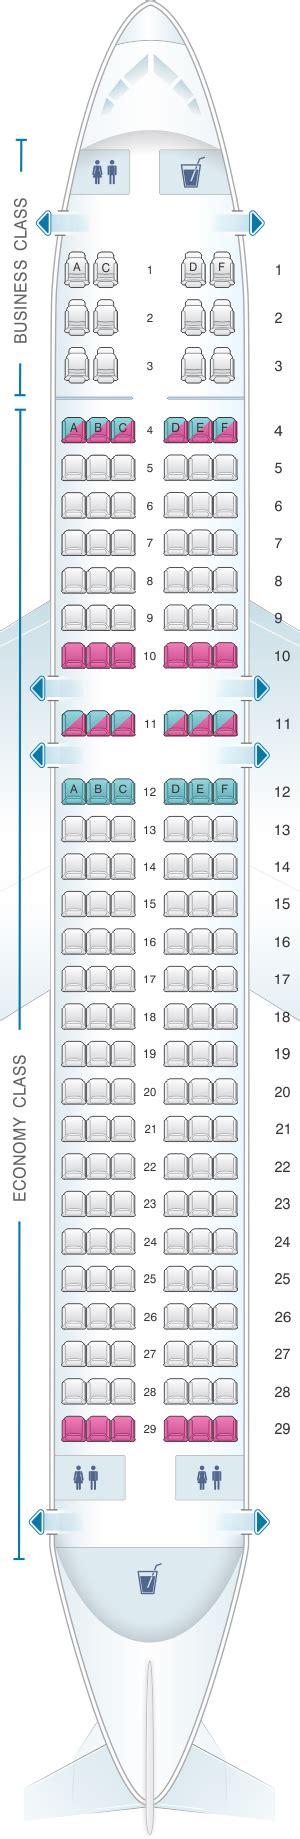 plan des sieges airbus a320 plan de cabine brussels airlines airbus a320 seatmaestro fr